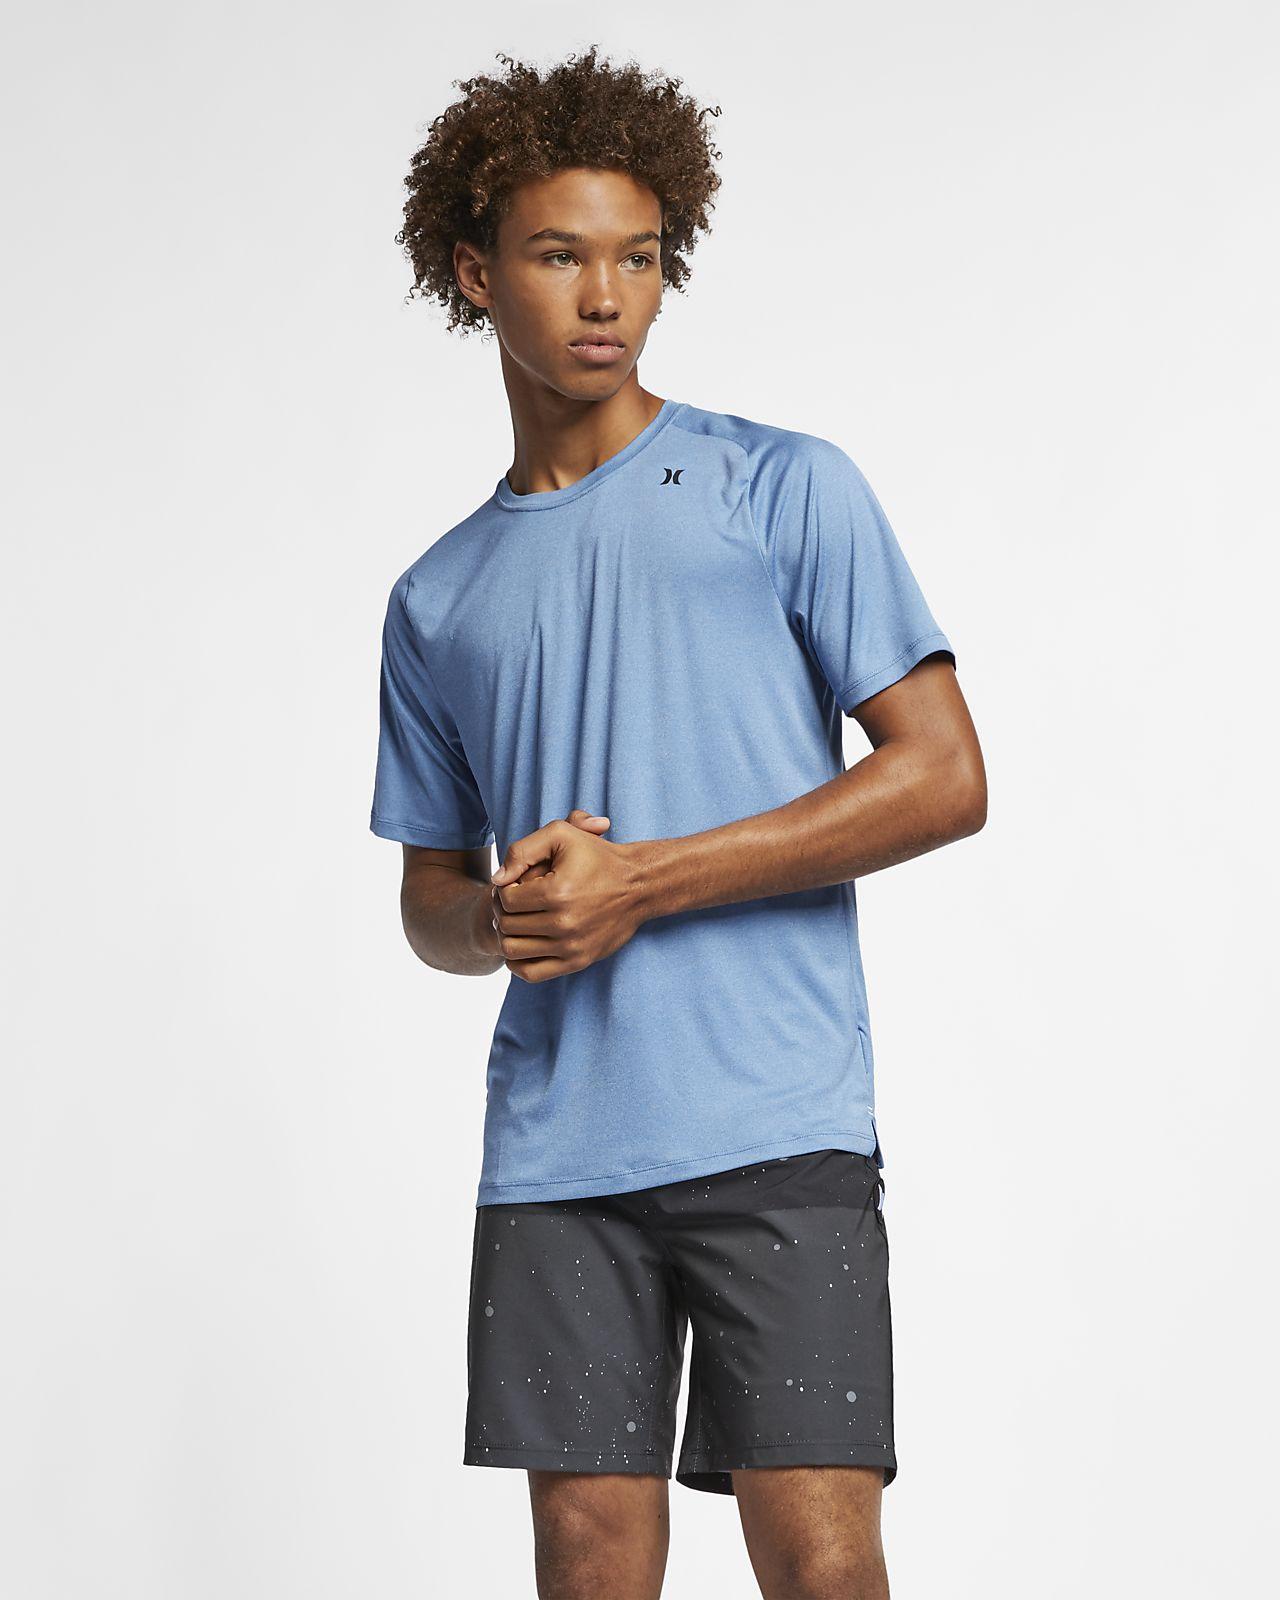 Hurley Quick Dry Men's T-Shirt